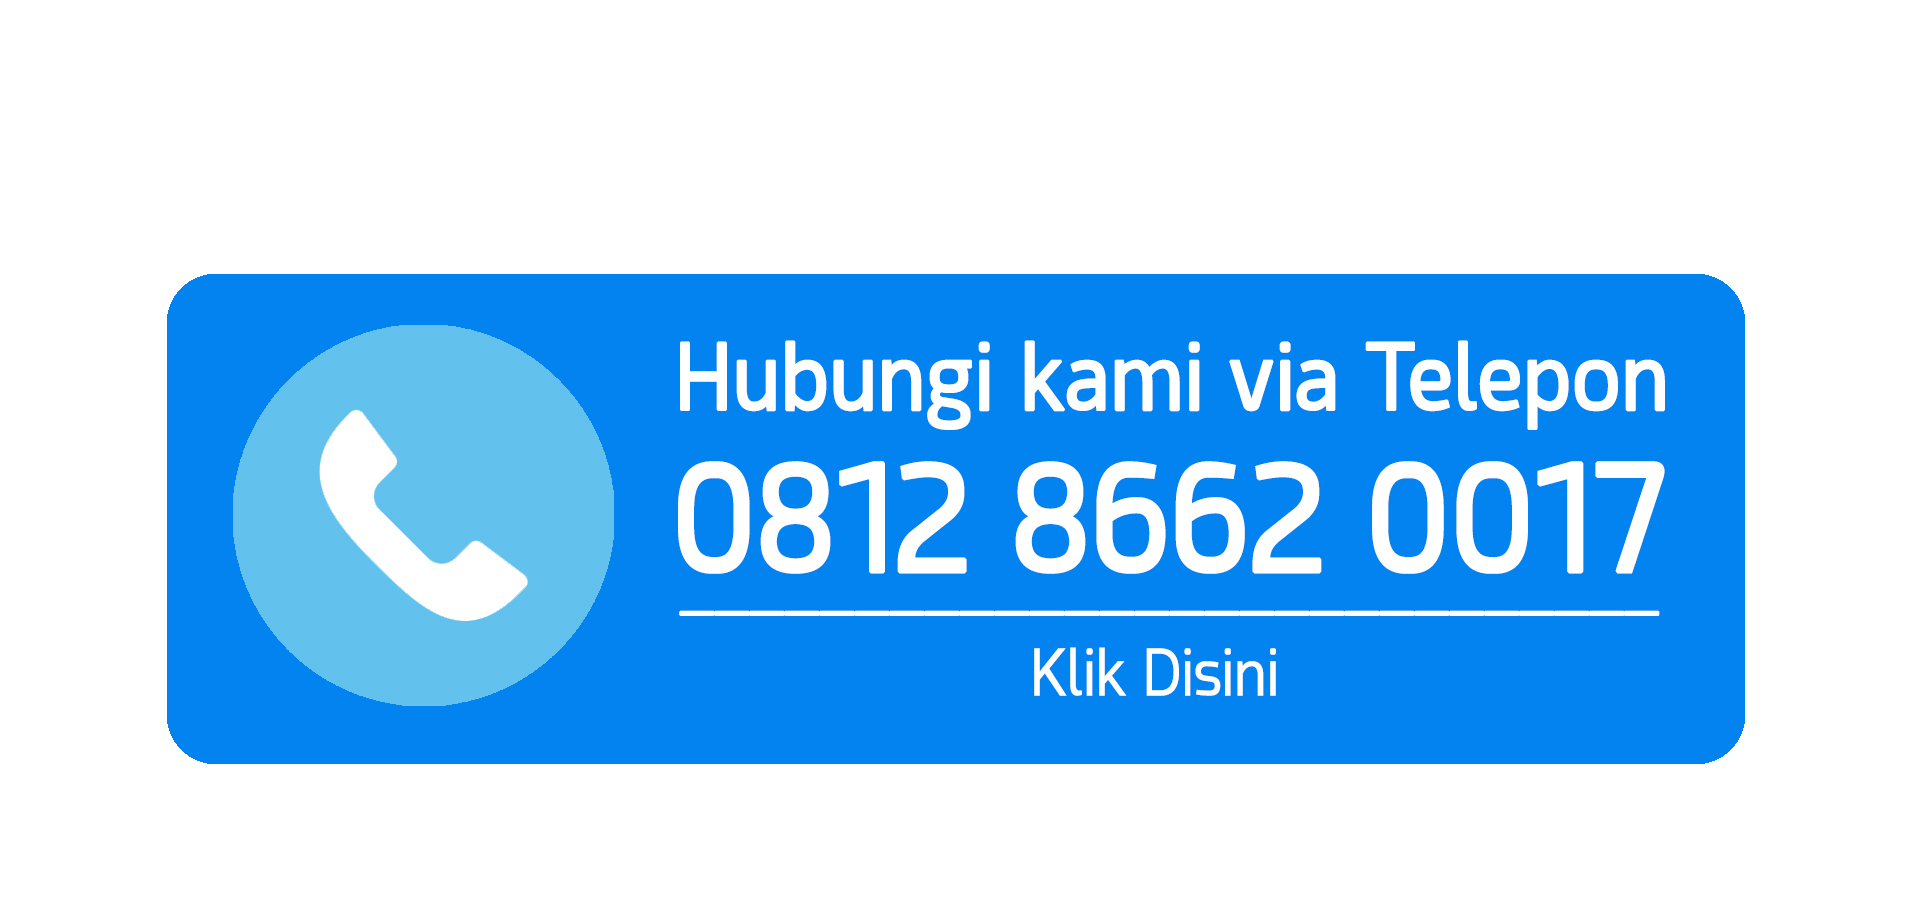 order konveksi online Jakarta.